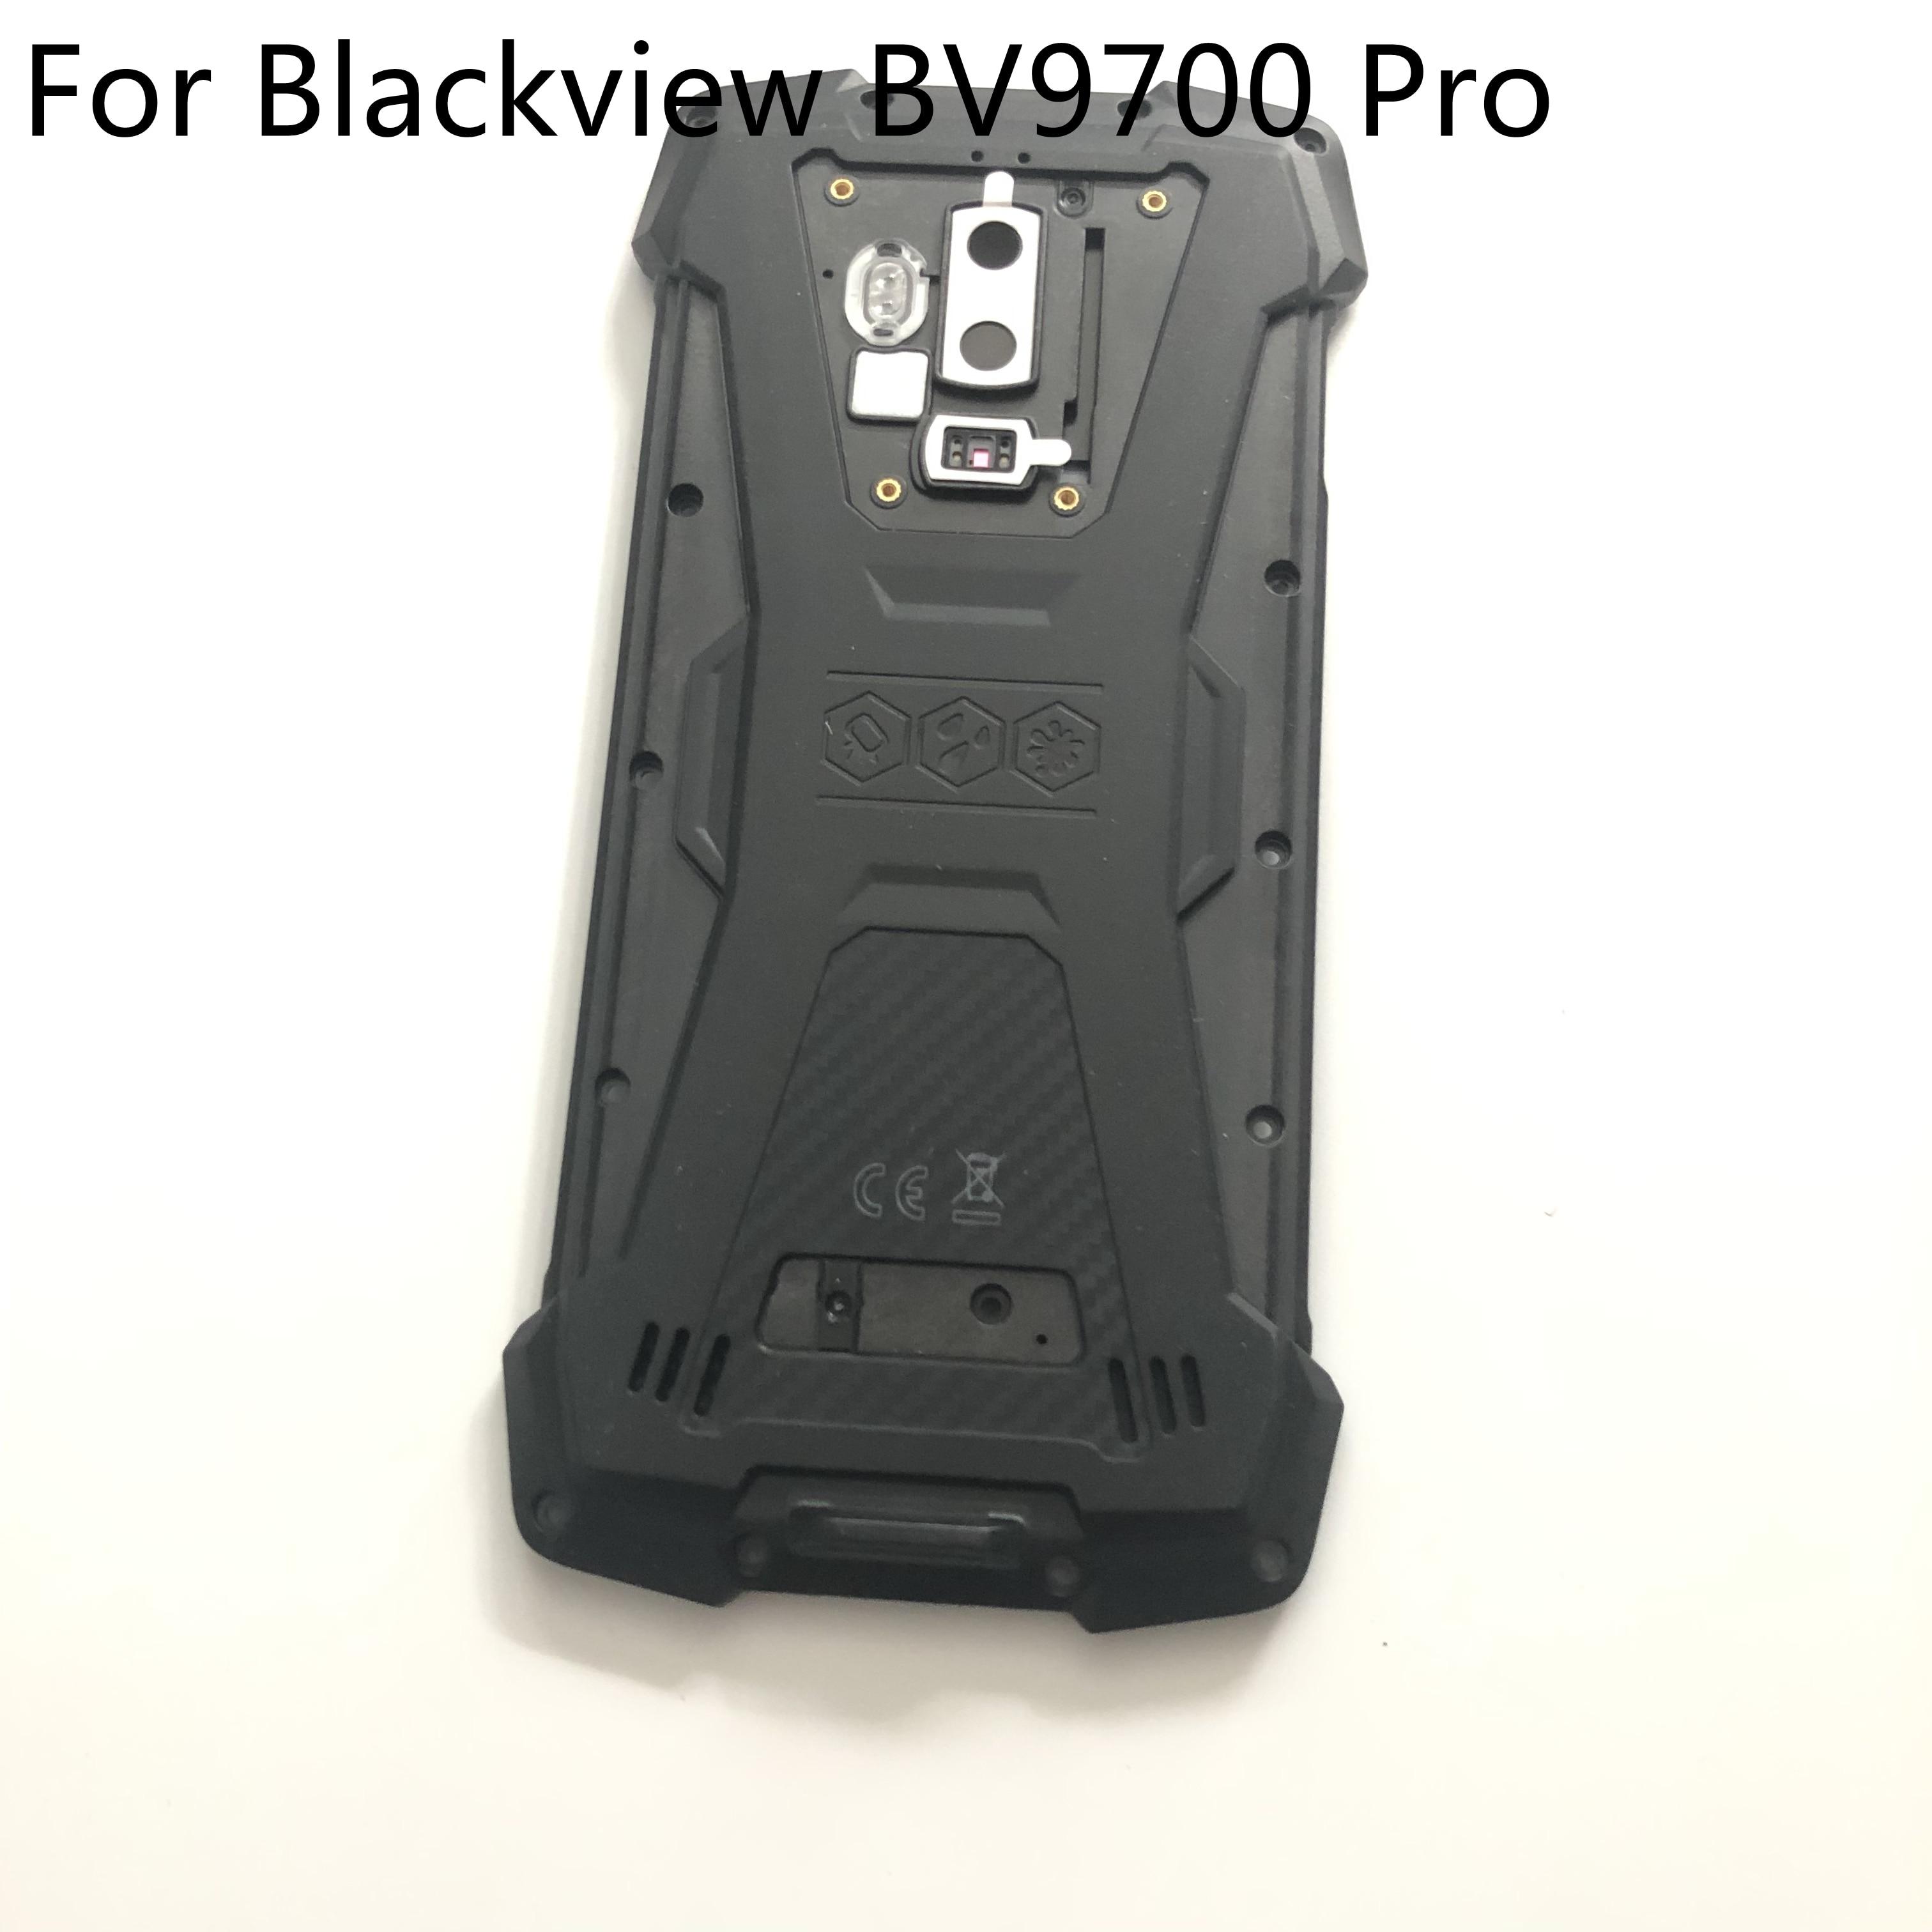 Blackview BV9700 Original New Protective Battery Case Cover Back Shell For Blackview BV9700 Pro MTK6771T 5.84inch 2280*1080